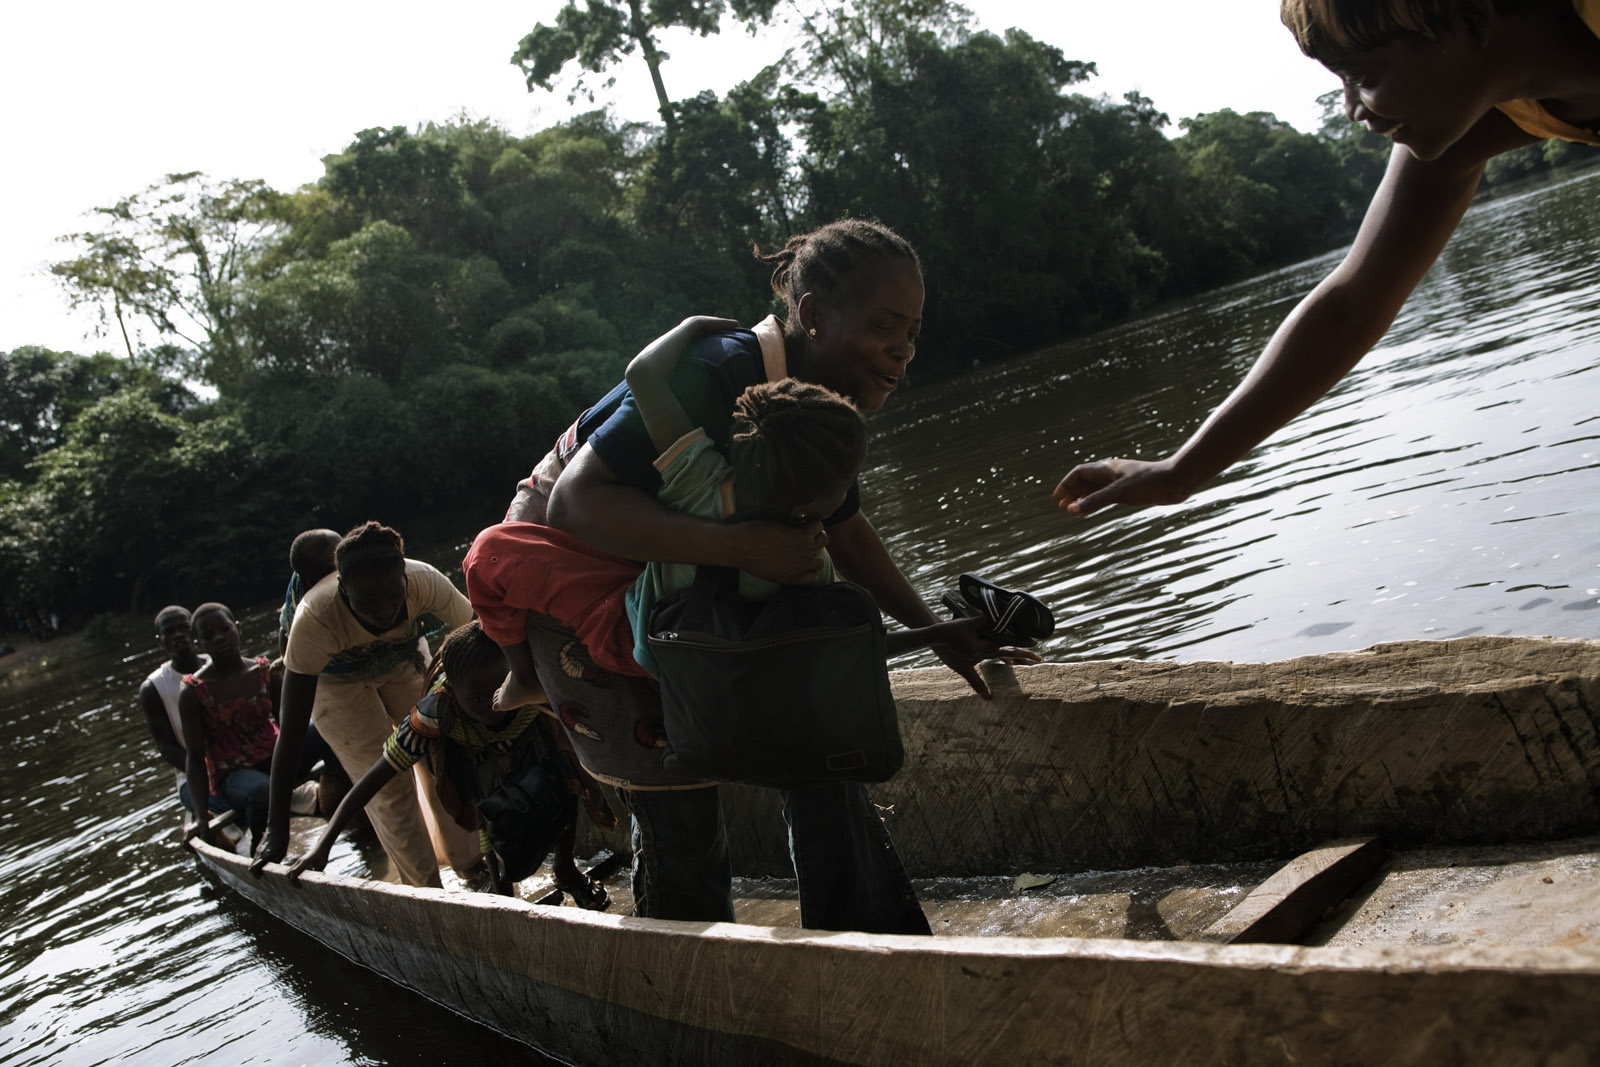 liberia-refugies-ivoiriens-0311-2265hd